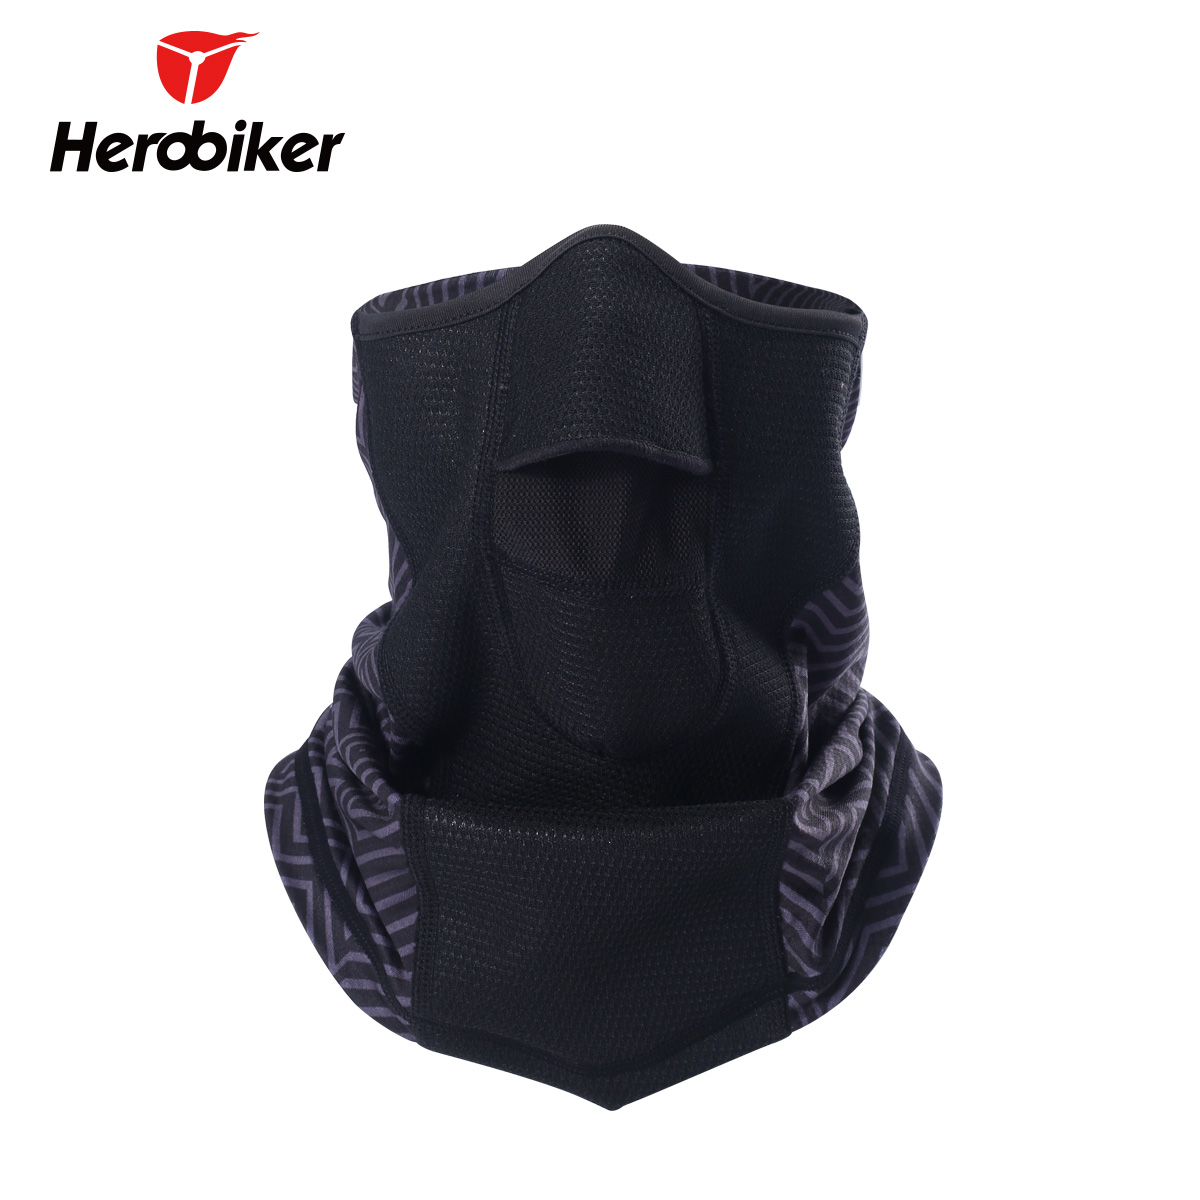 HEROBIKER Unisex Motorcycle Windproof Cool Camouflage Face Mask Black Motorcycle Helmet Mask Summer Bicicletas De Paseo